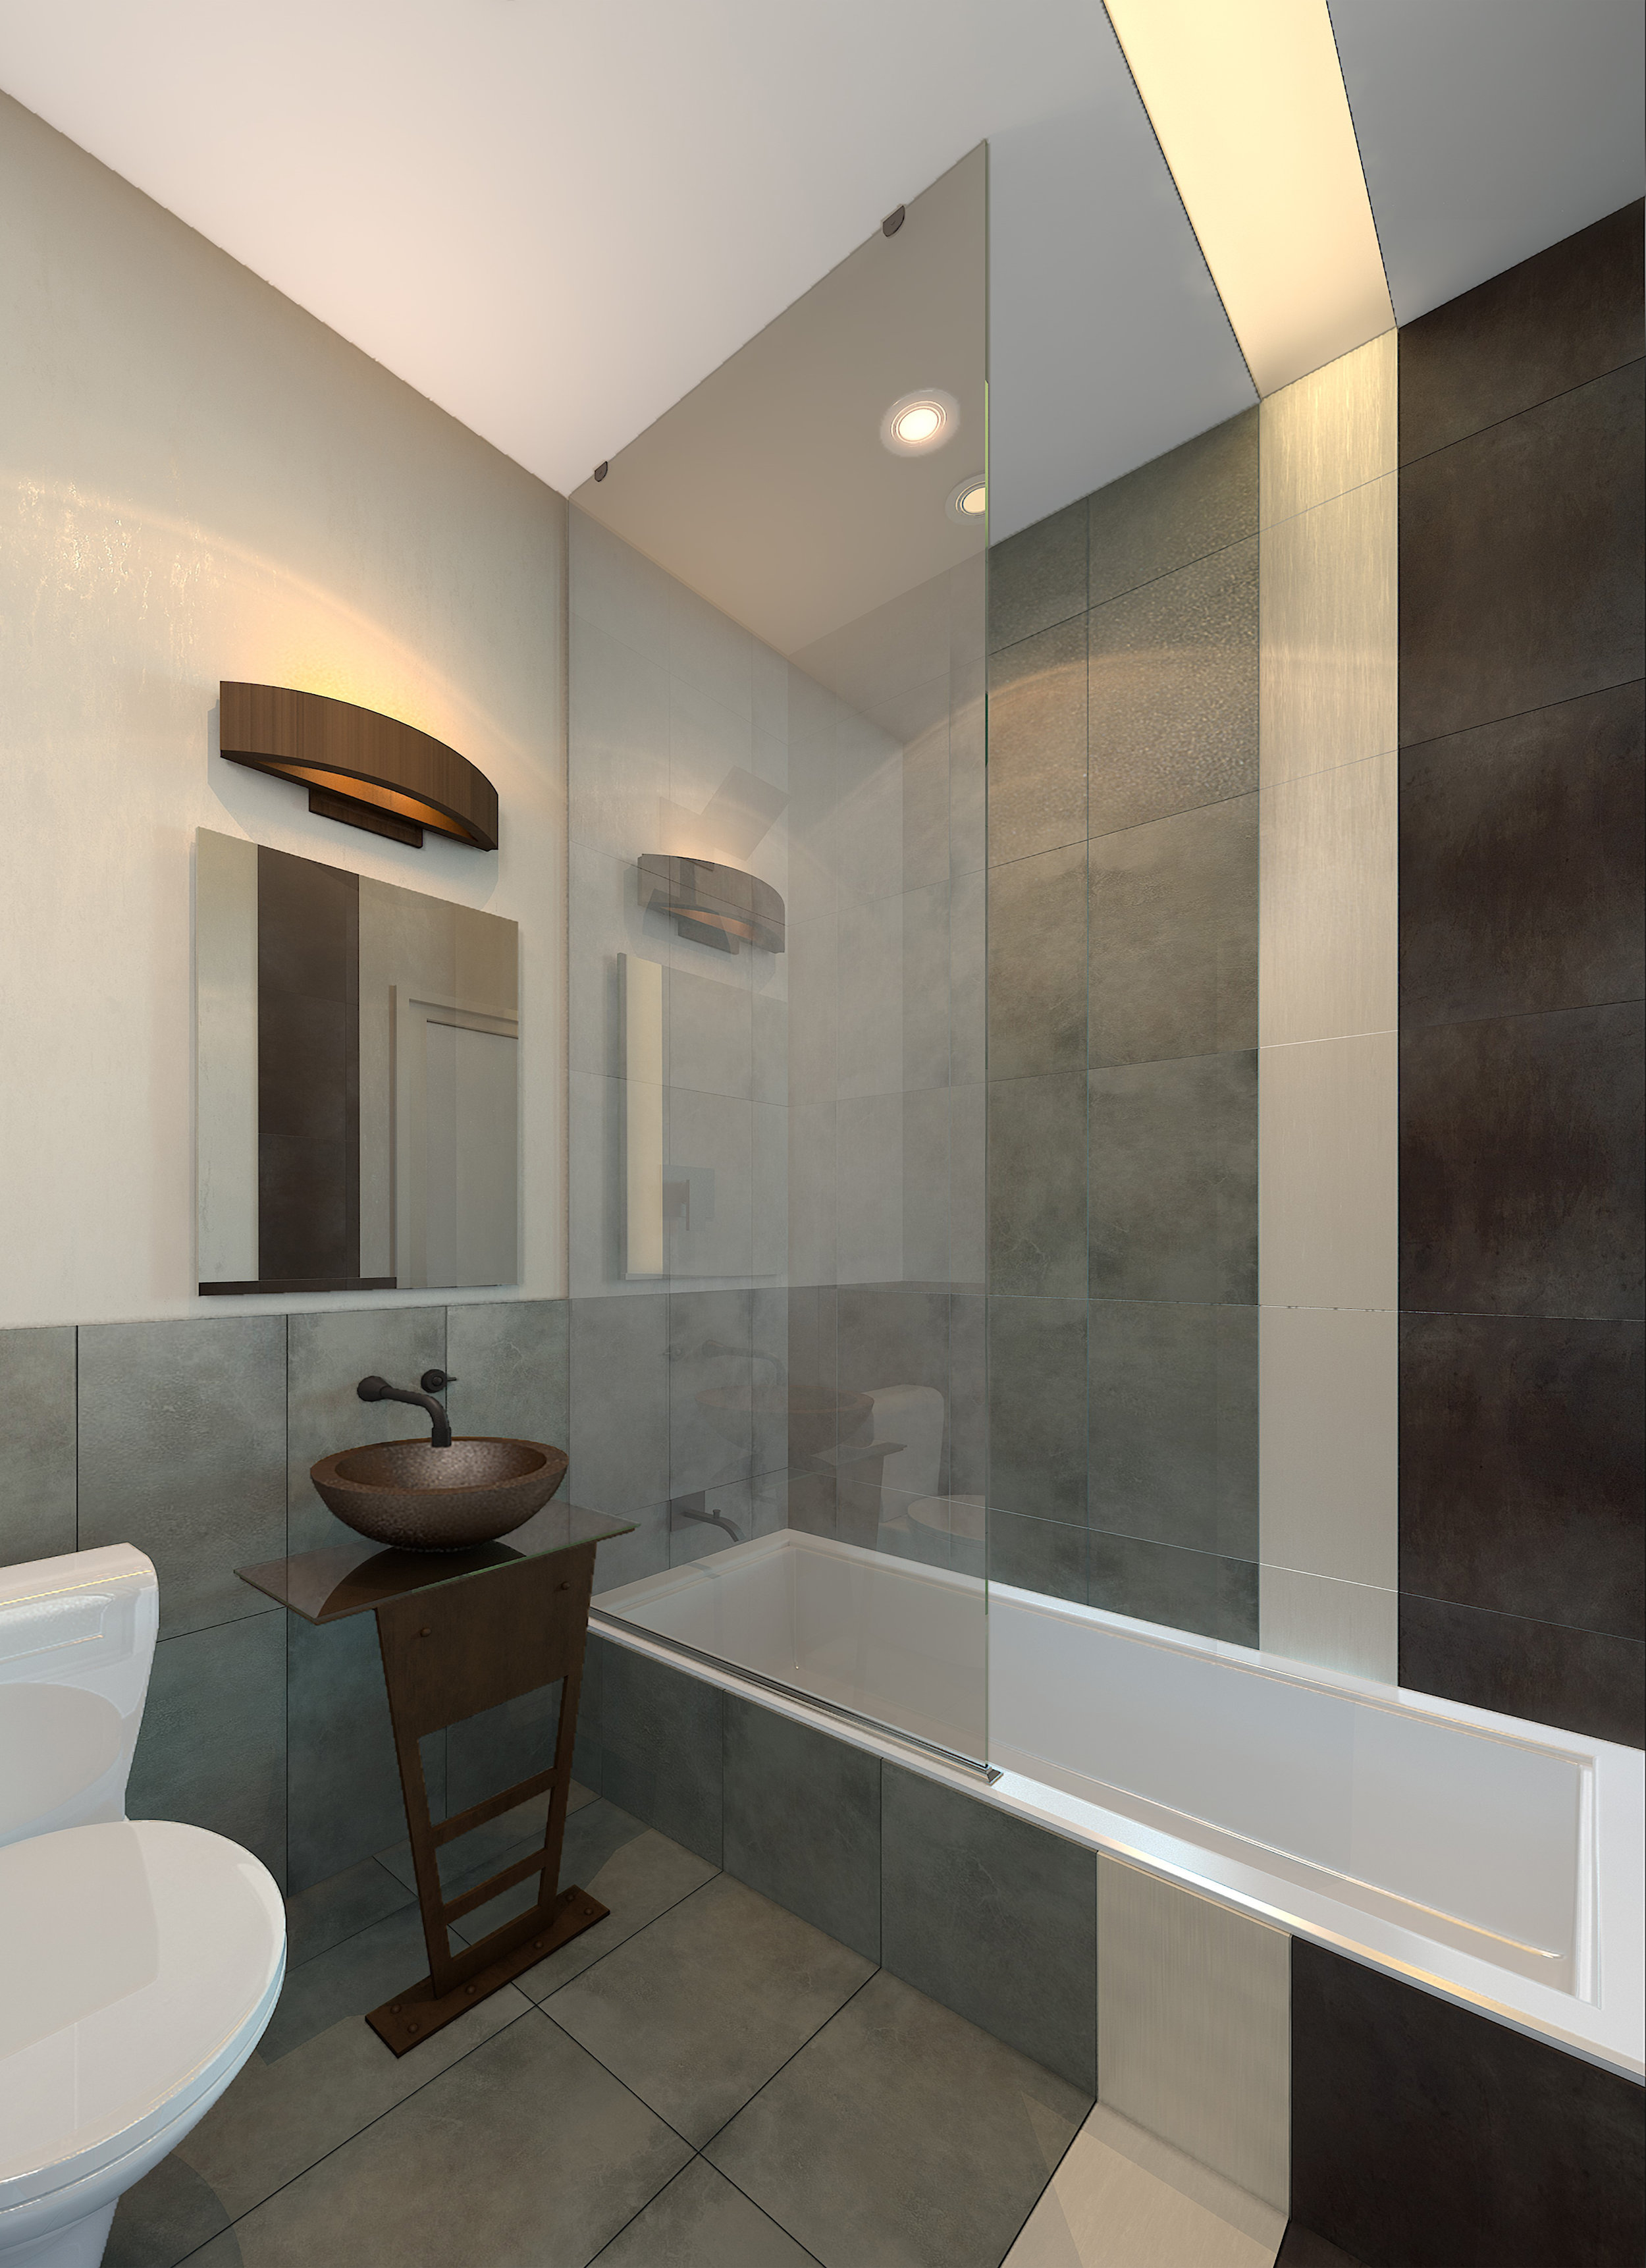 185 Freeman Bathroom VIEW 1.jpg